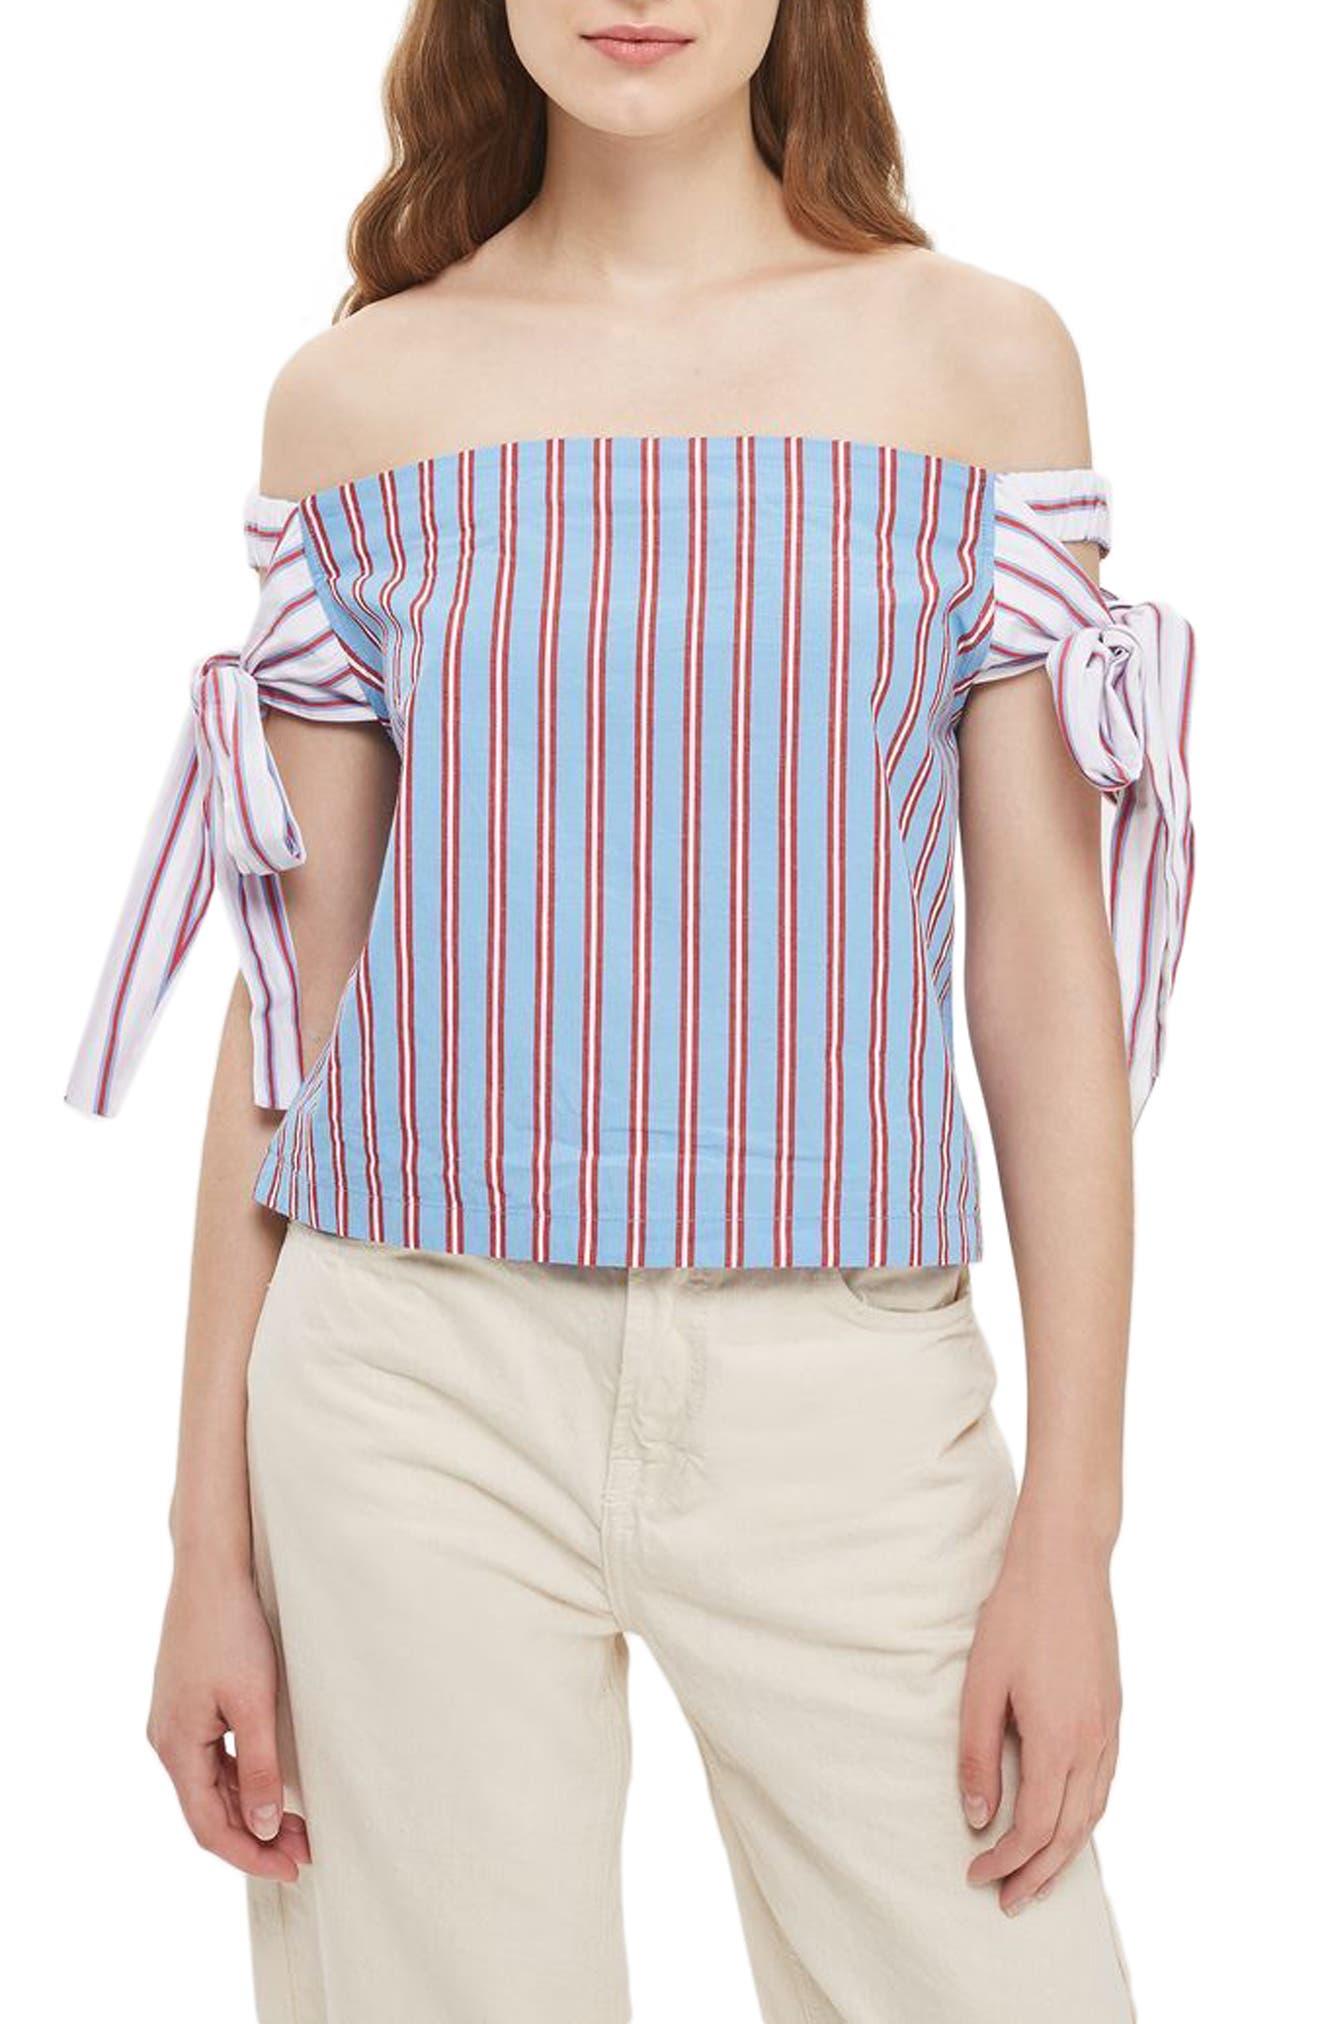 TOPSHOP Stripe Tie Off-the-Shoulder Top